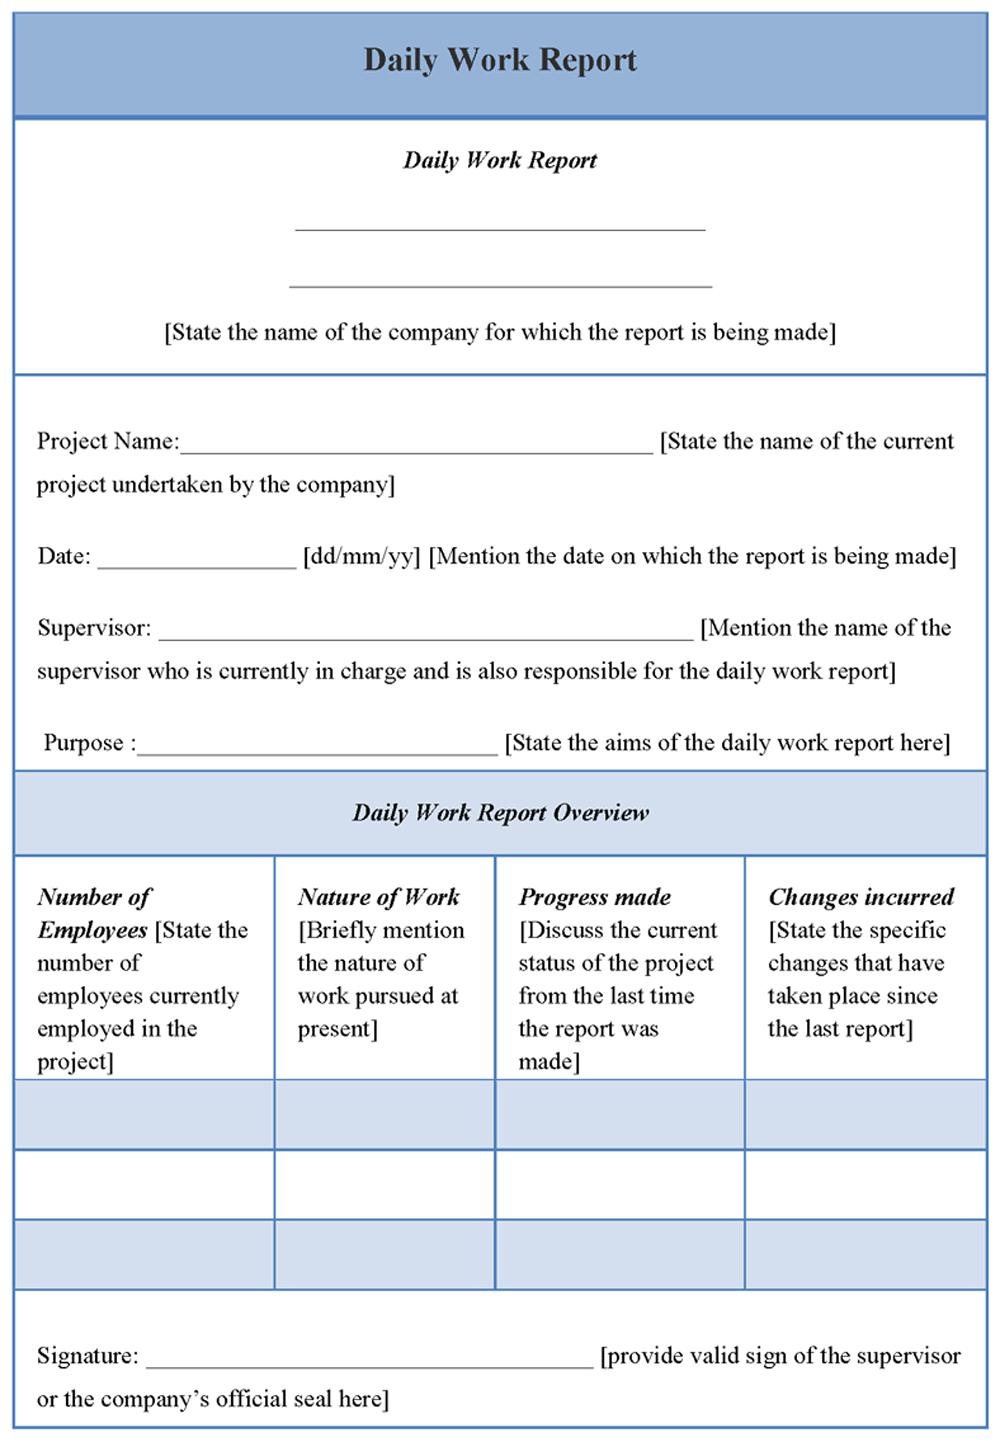 Daily Work Report Template   Report Template, Resume Regarding Rapporteur Report Template